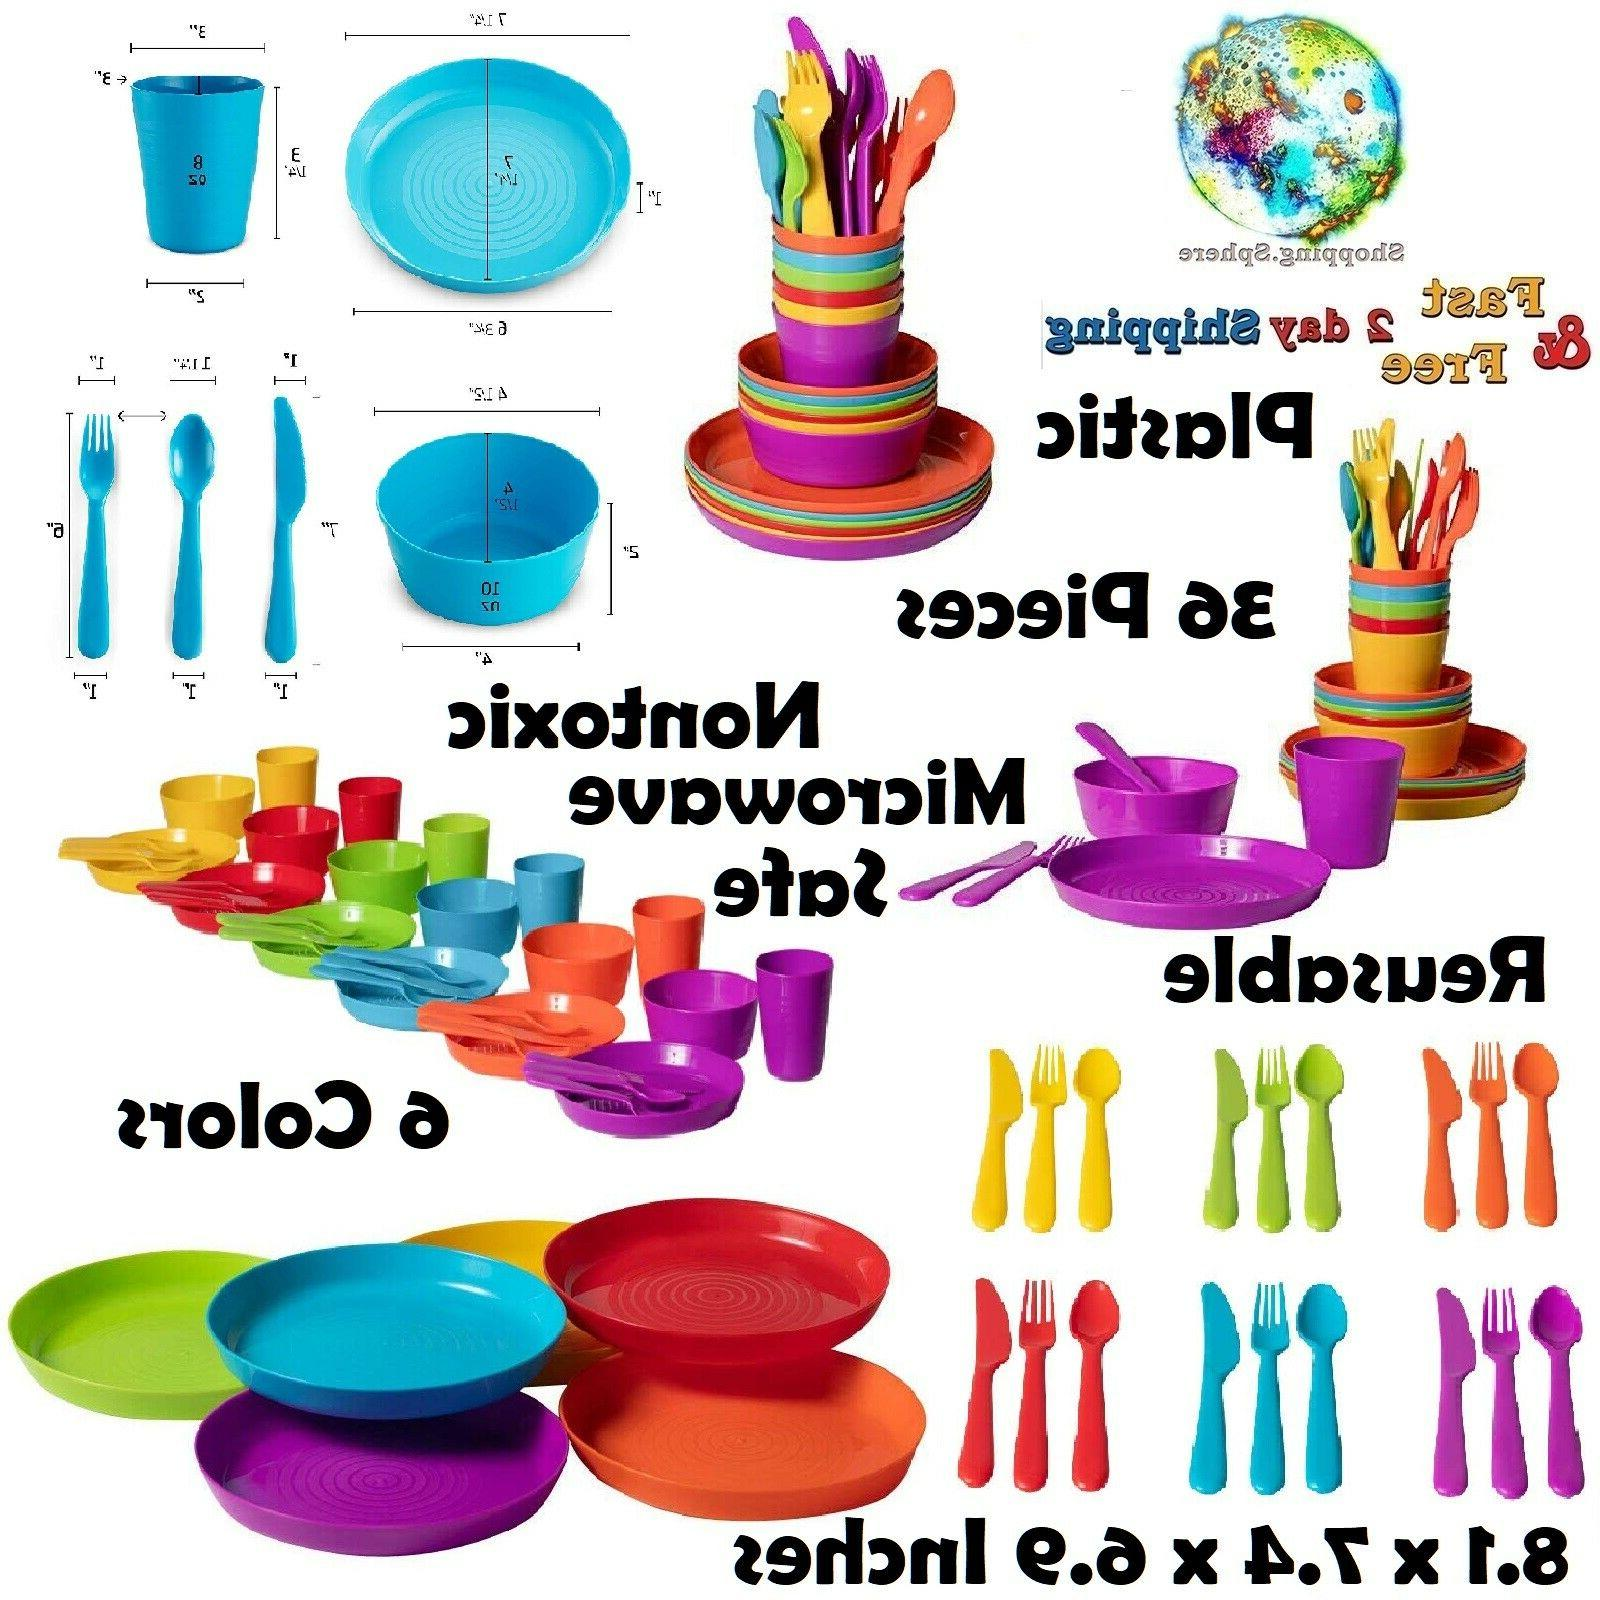 Plastic Dinnerware Set 16 Piece Dinner Sets Kitchen Dining E